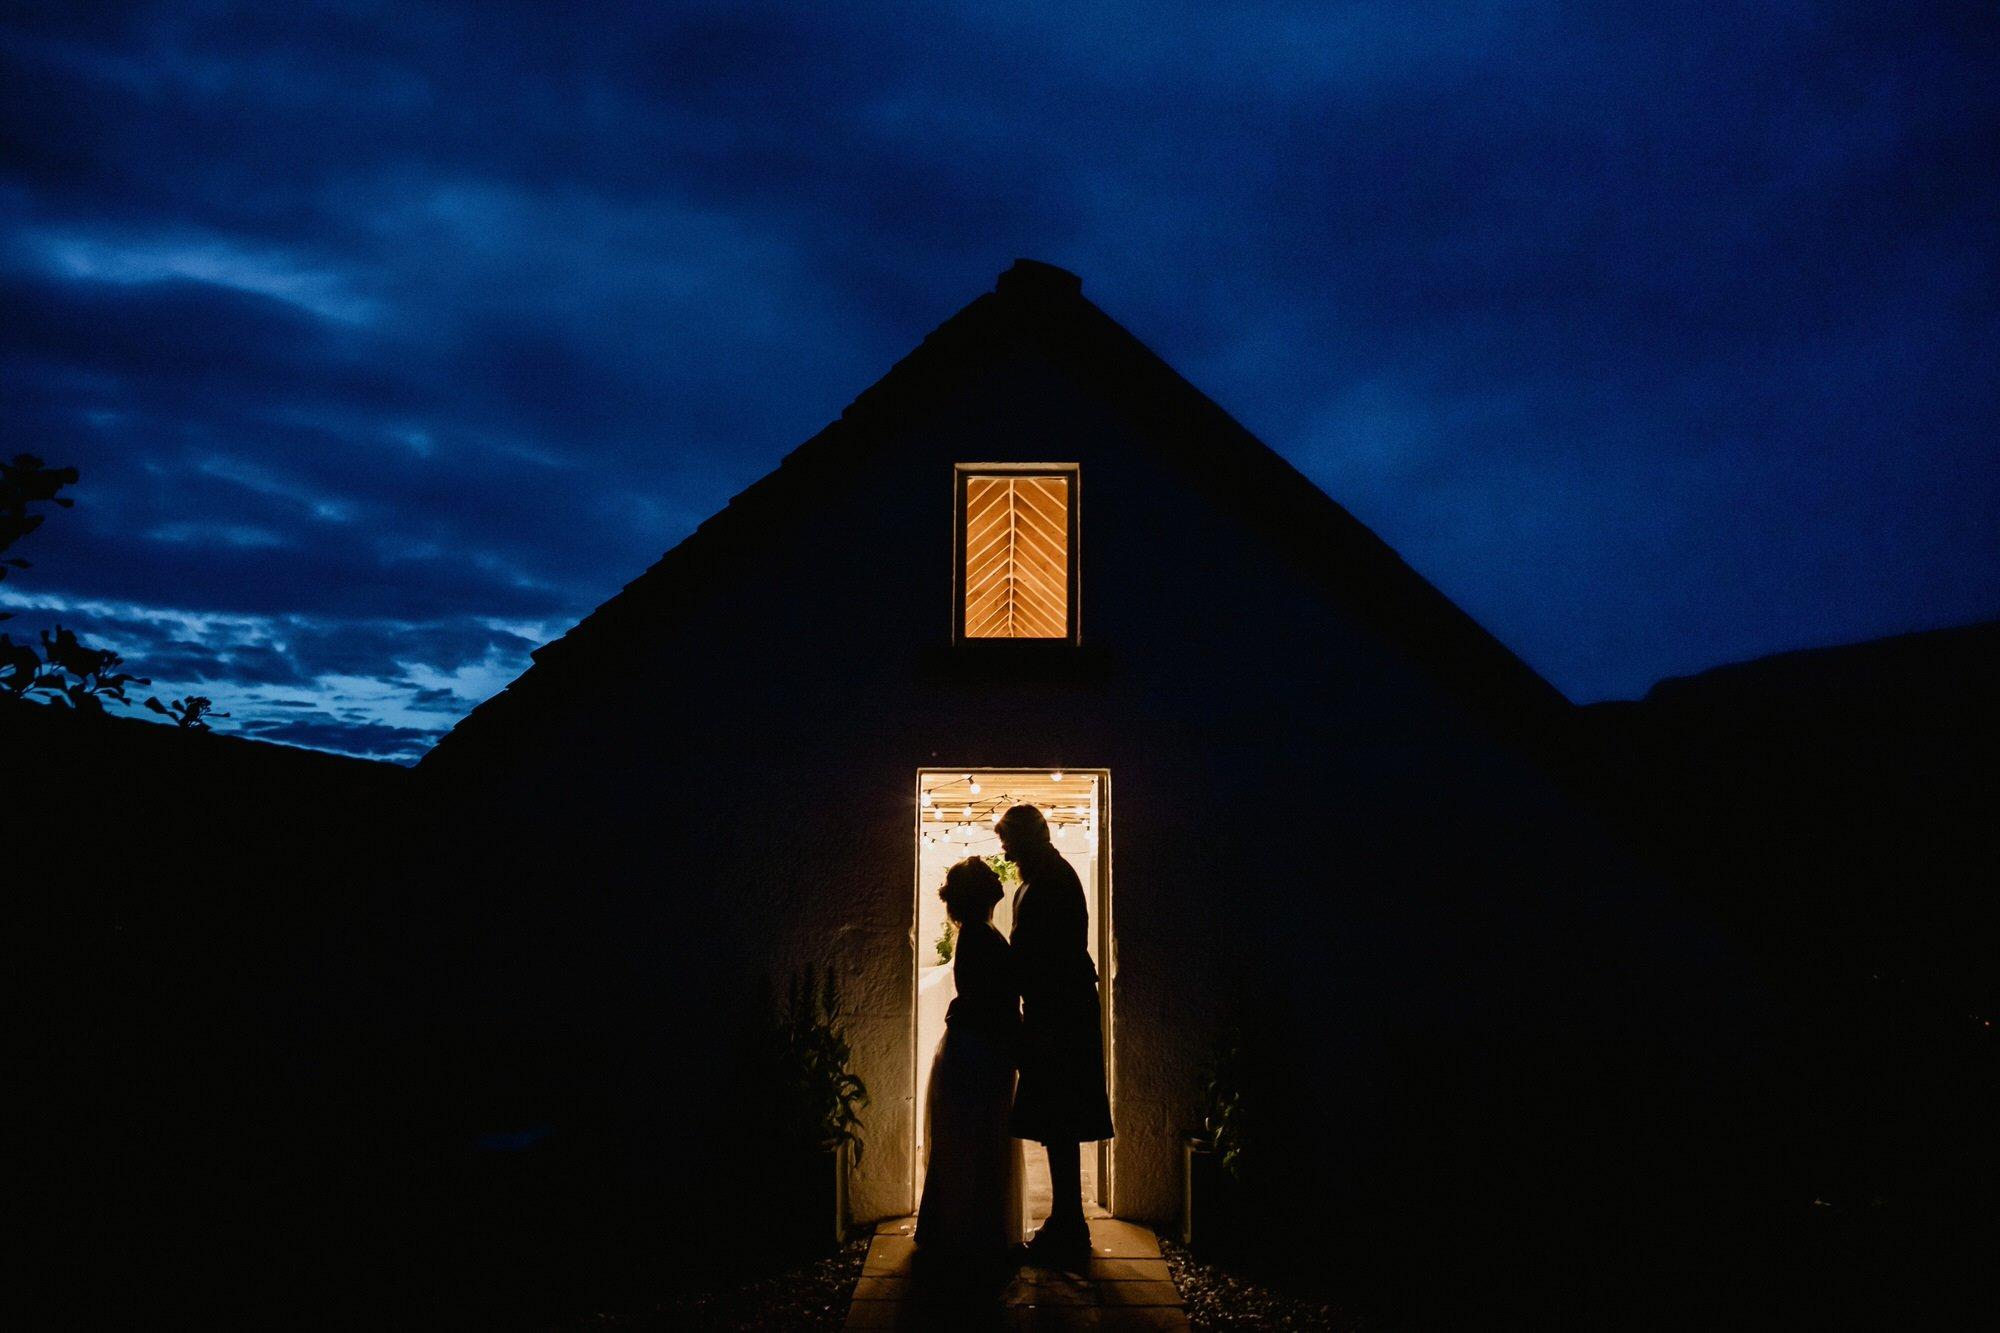 075 STONE BOTHY AT NIGHT TIN SHED KNOCKRAICH WEDDING AUSTRIAN SCOTTISH ZOE ALEXANDRA PHOTOGRAPHY